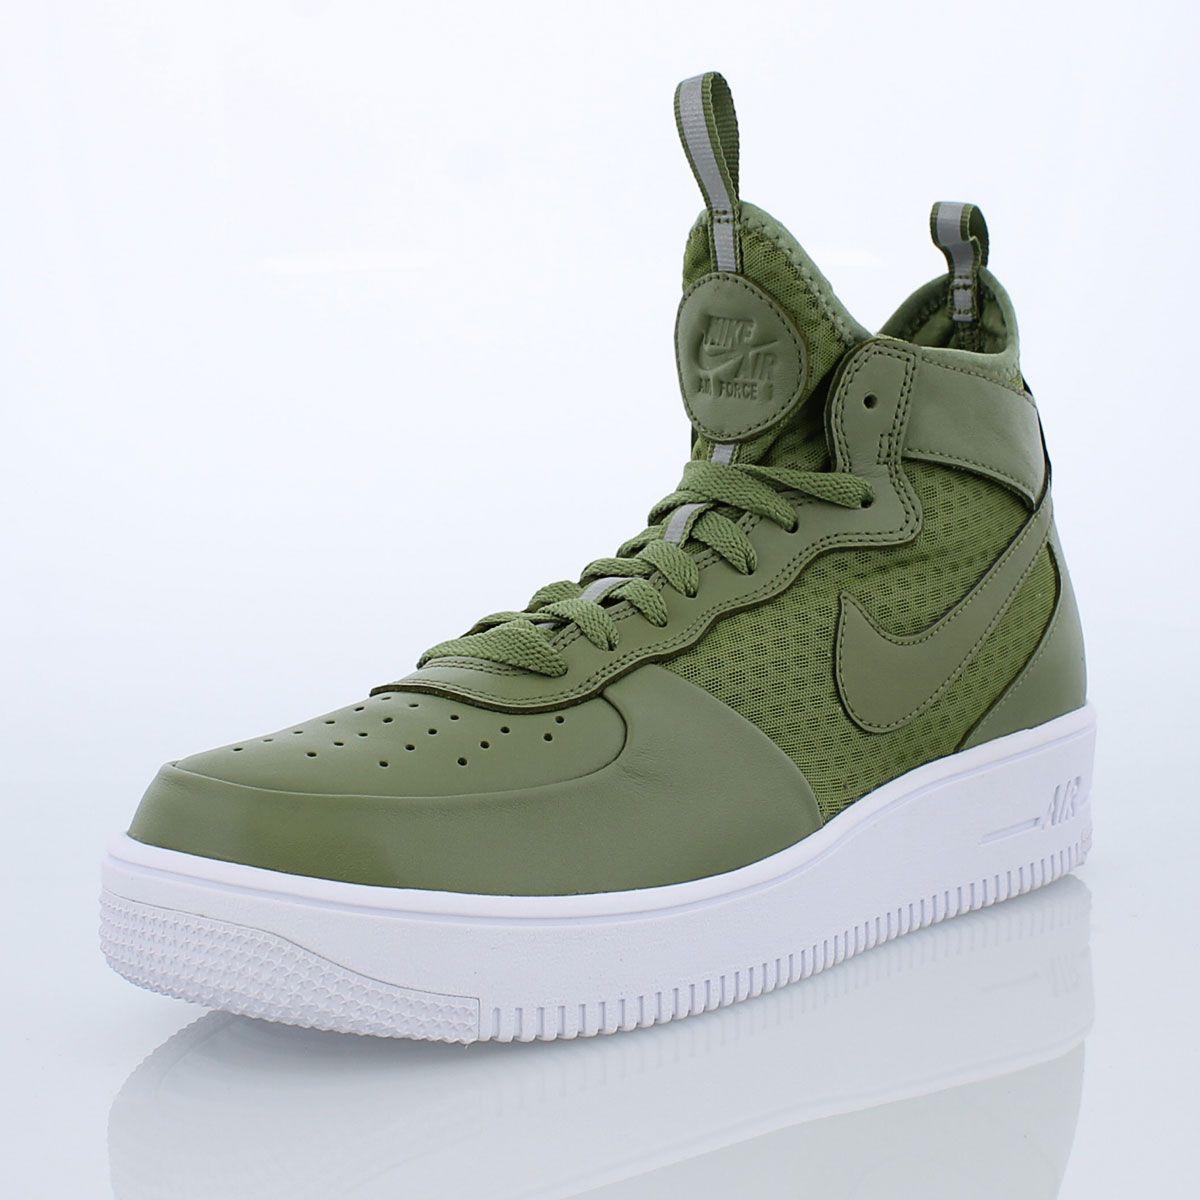 nike air force 1 ultraforce metà delle scarpe nike pinterest nike